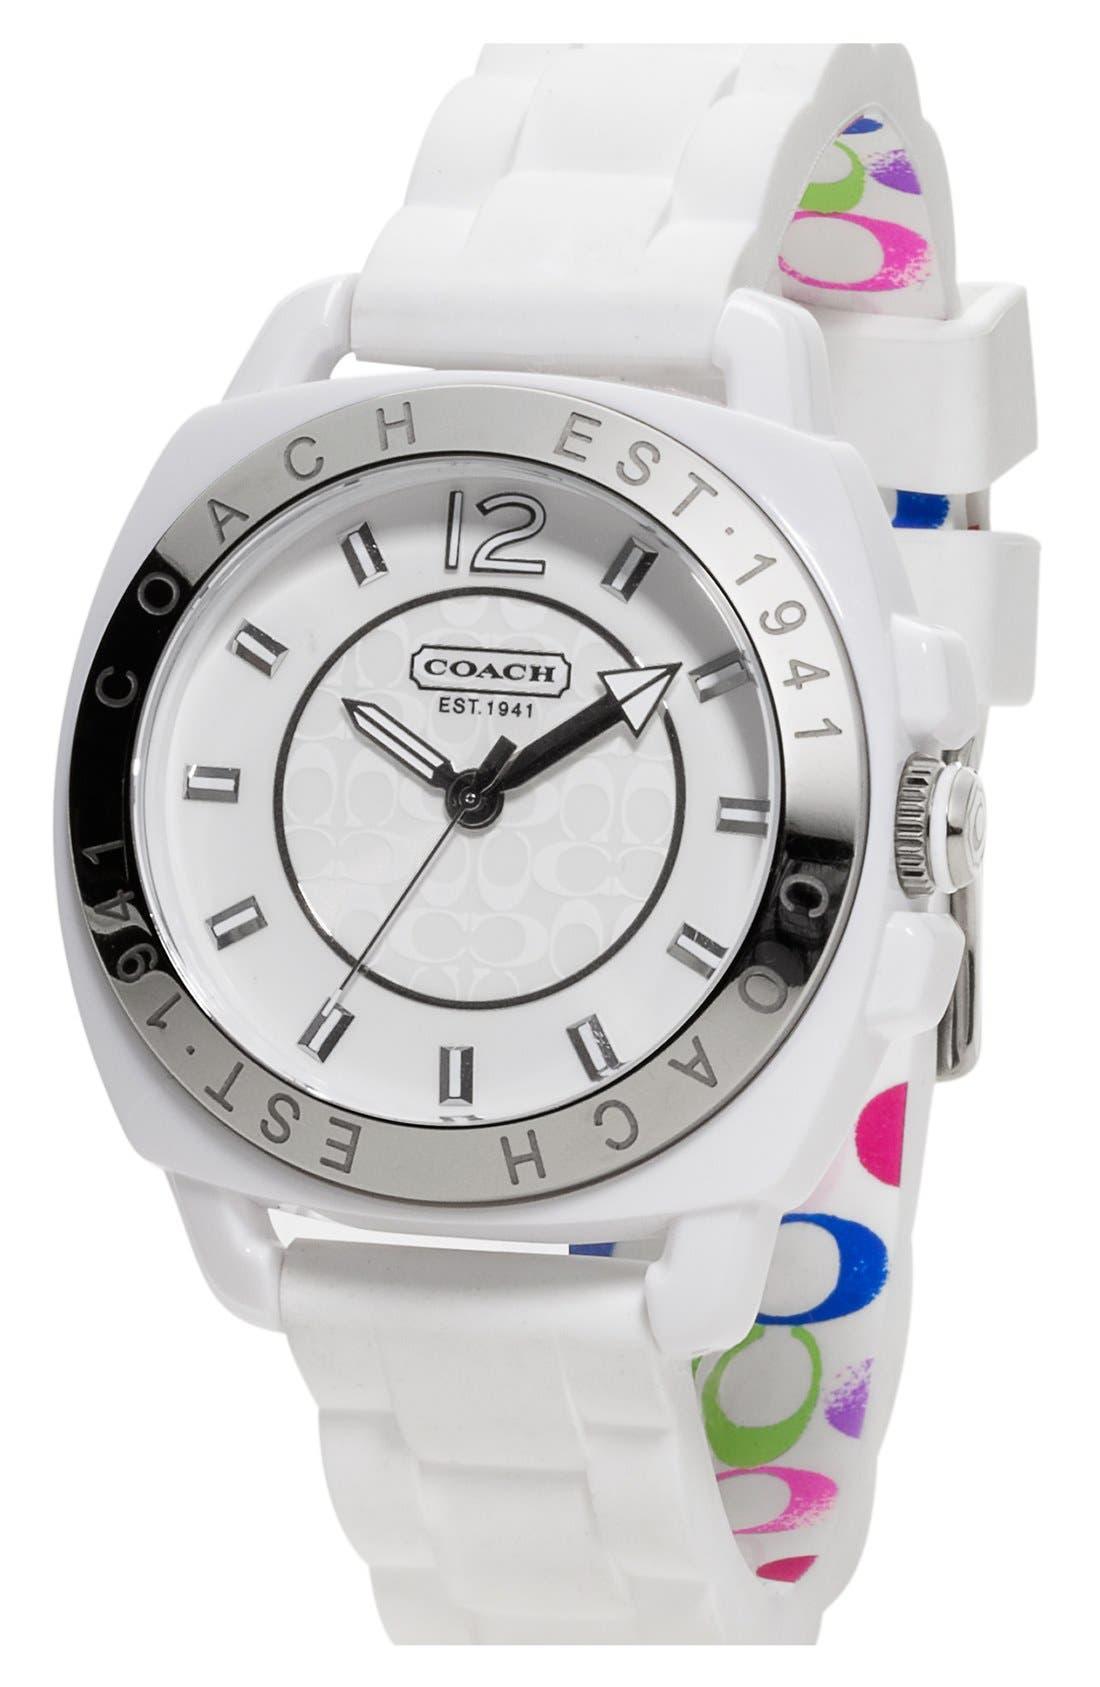 Main Image - COACH 'Boyfriend' Rubber Strap Watch